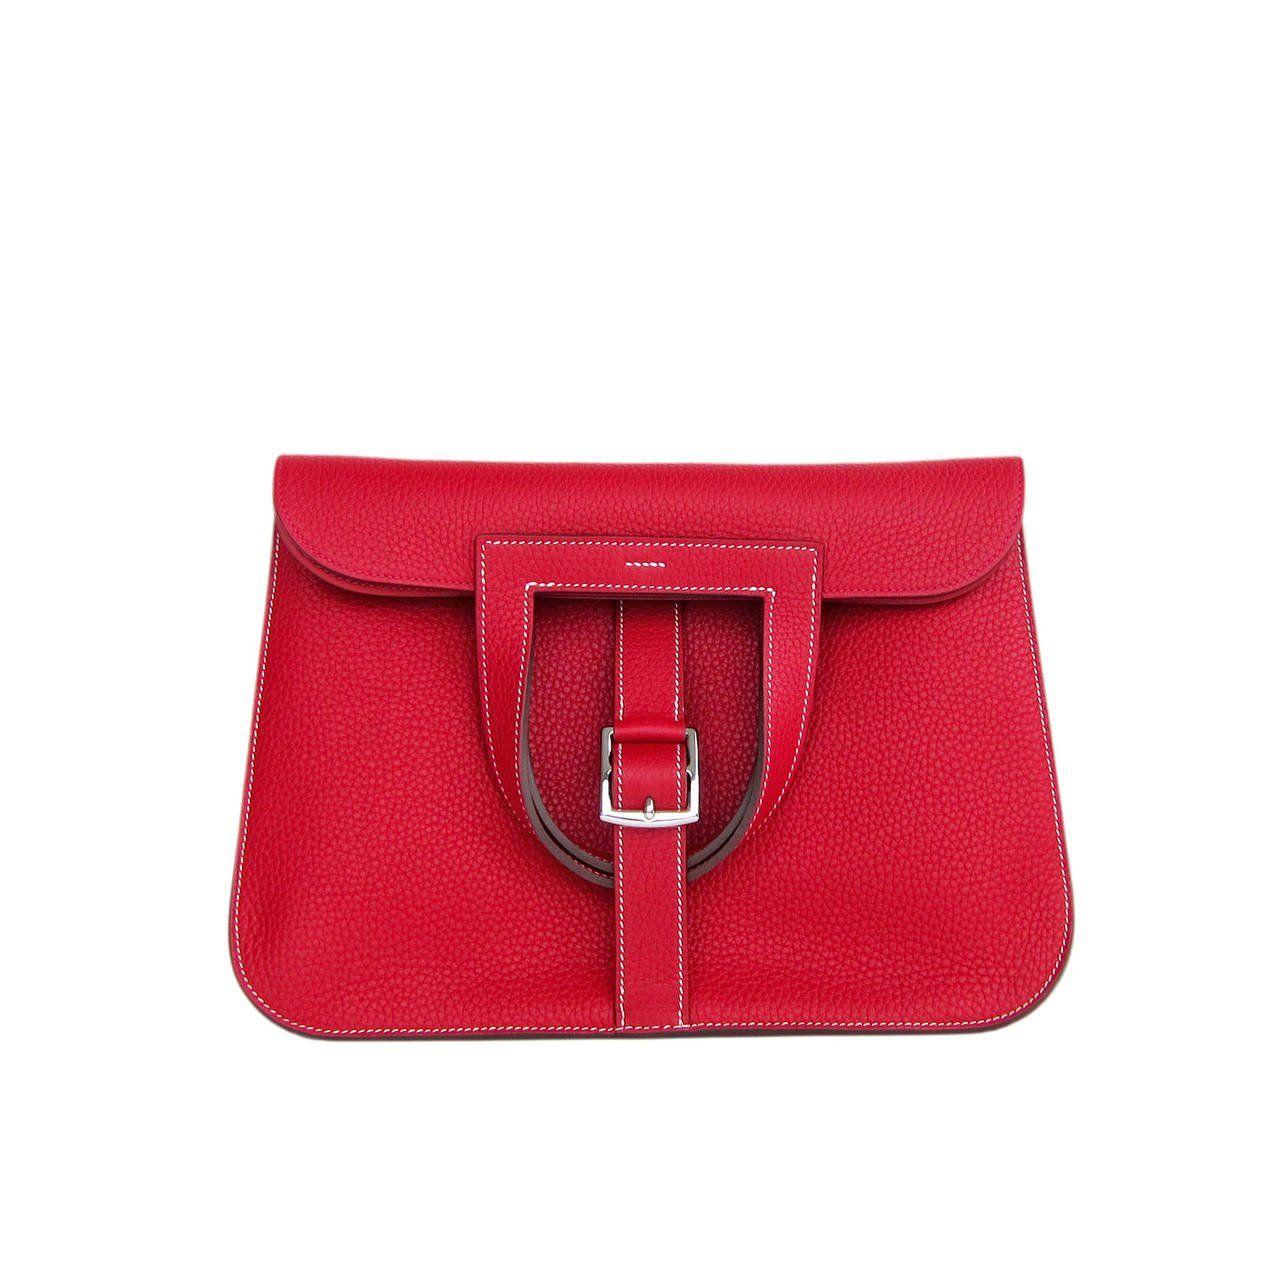 b844eb320f0b Hermes Rouge Casaque Red Halzan 4-way Clemence Crossbody Bag at 1stdibs